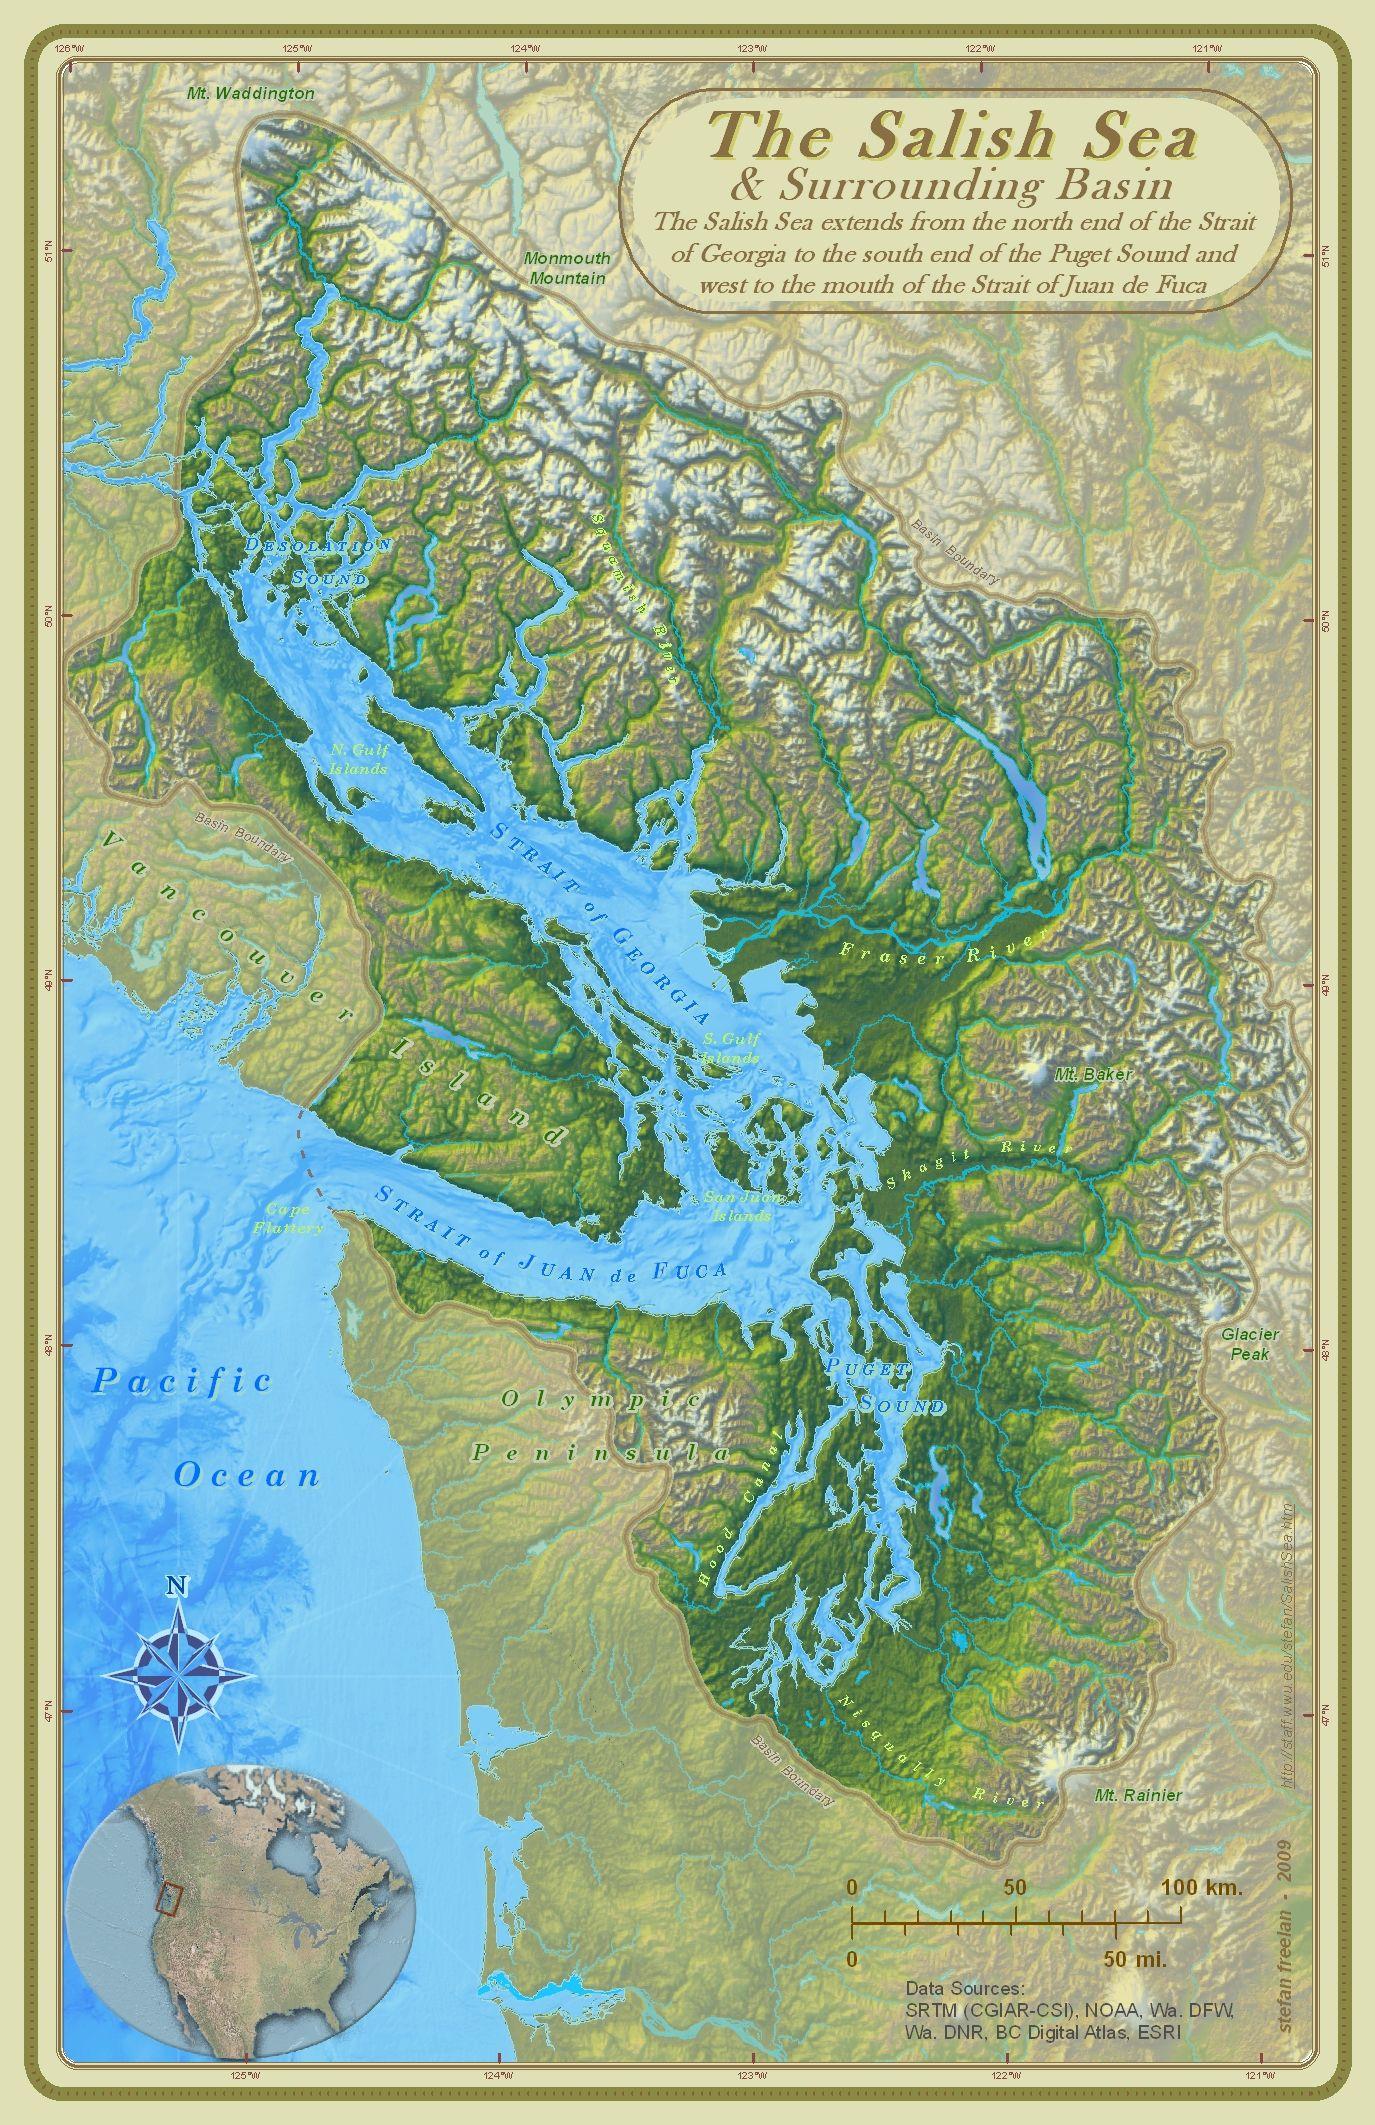 Cartographer Stefan Freelan of Western Washington University